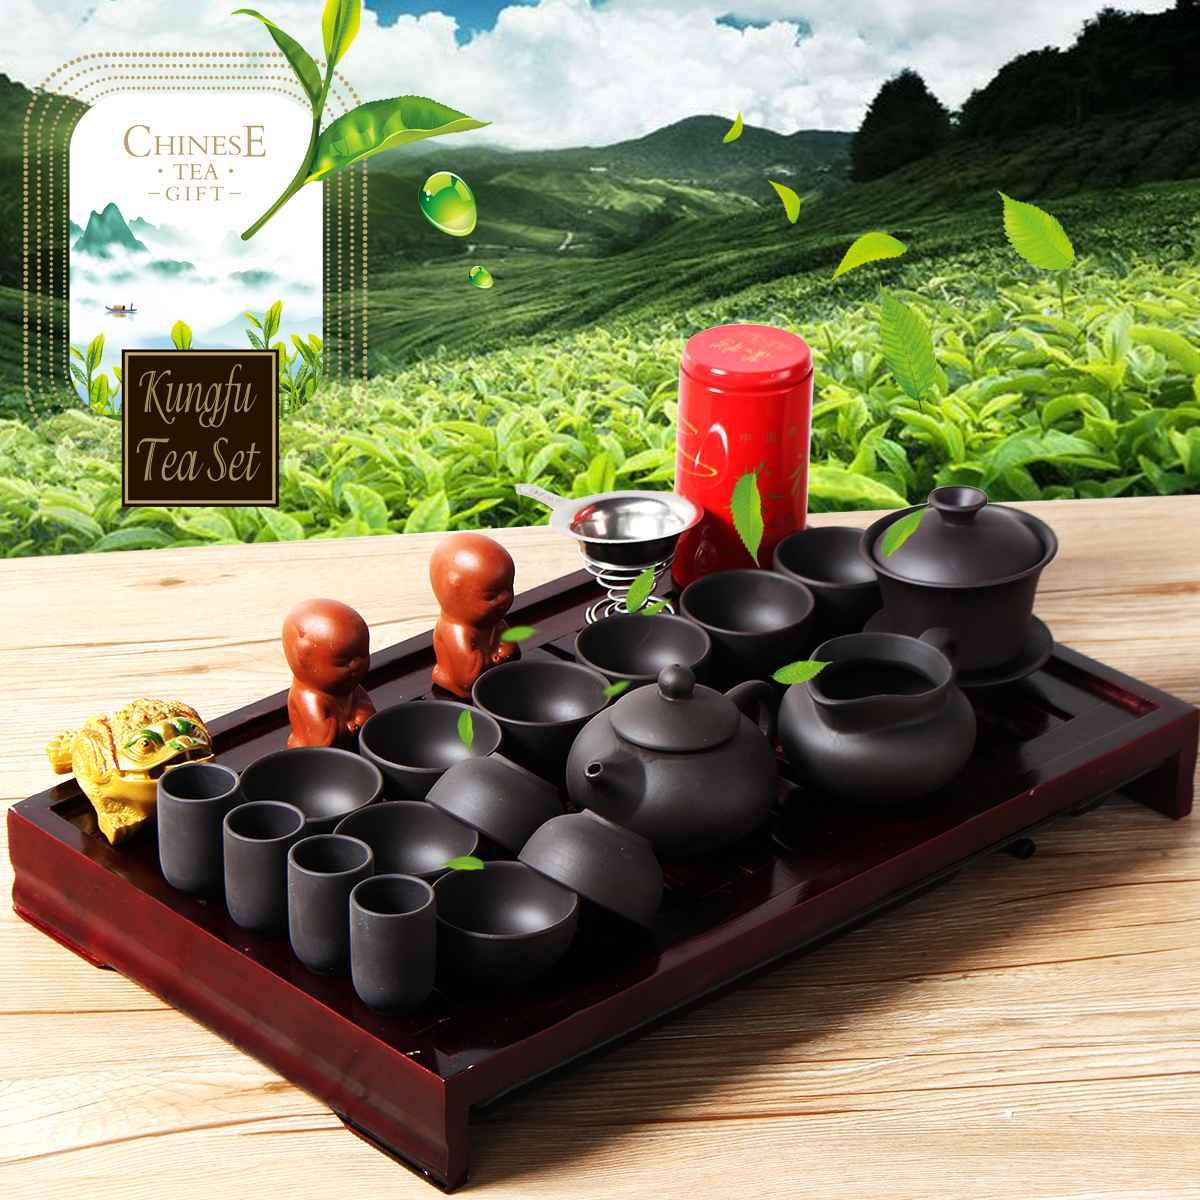 Chinese Porcelain Kung Fu Tea Set Wooden Tea Tray Tea Pet Teapot Tools Home Kitchen Teahouse Teaware Set Drinkware Tea Service